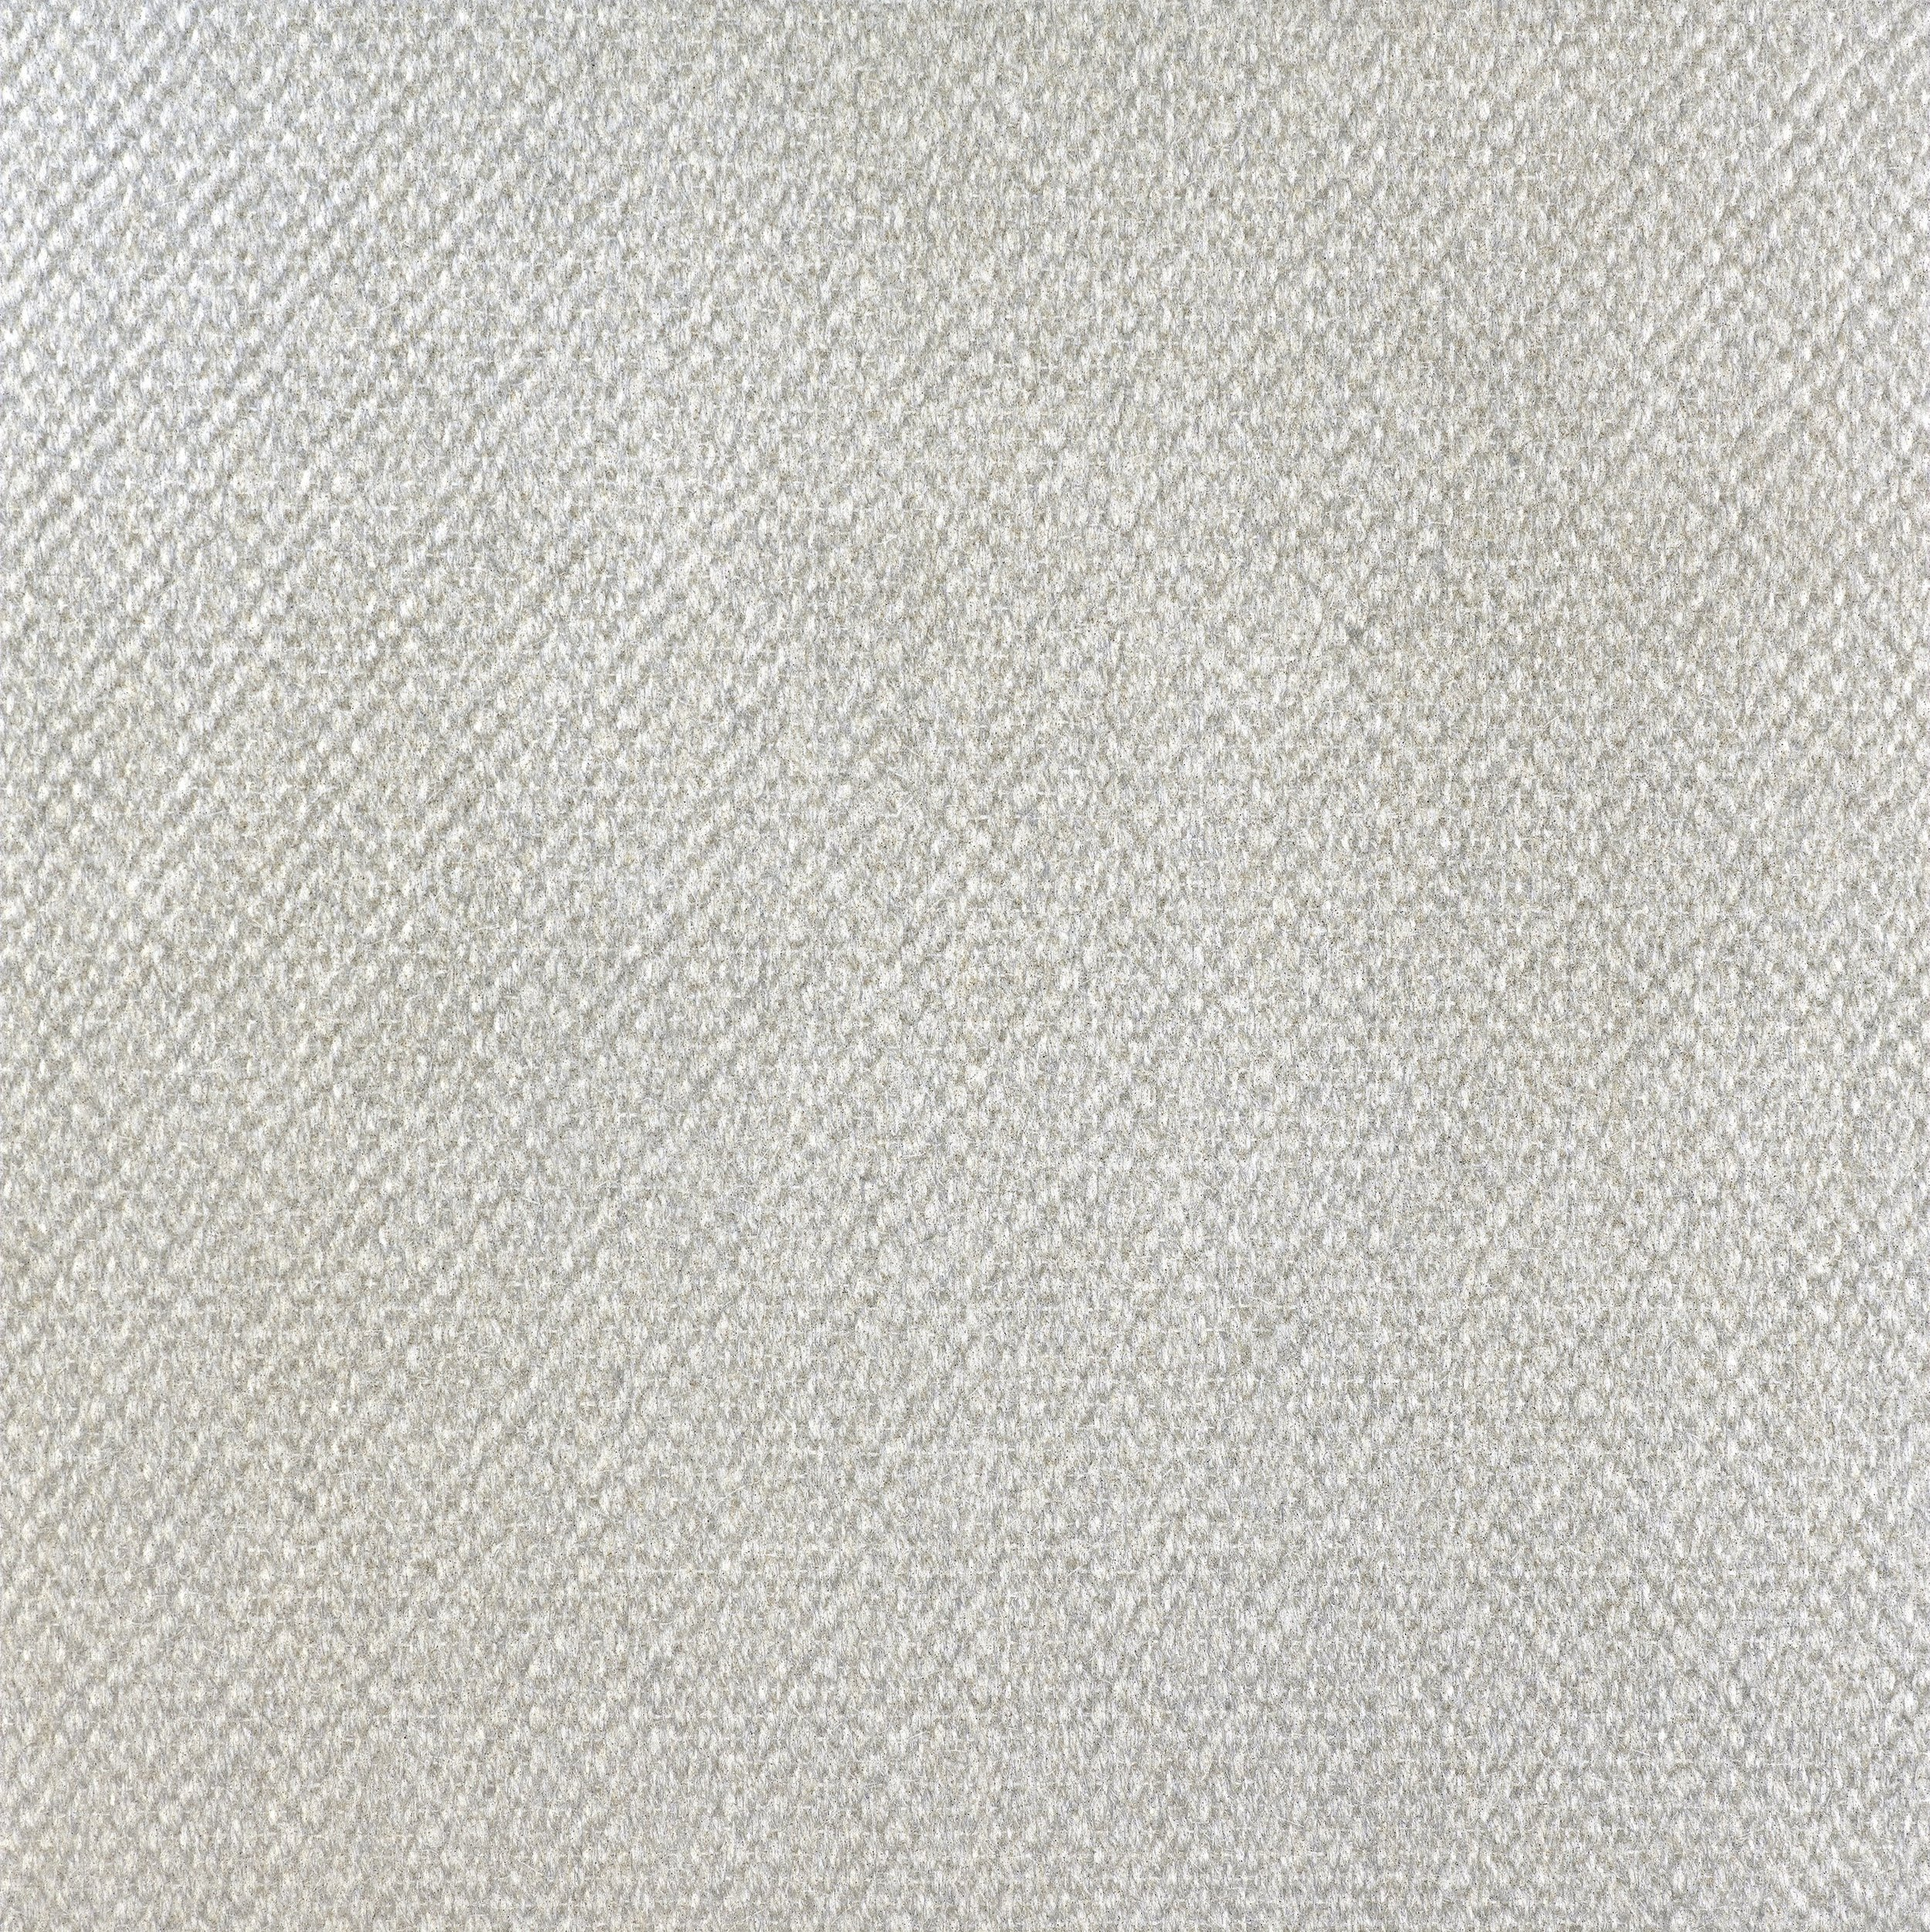 Carpet Waterfall 60x60cm